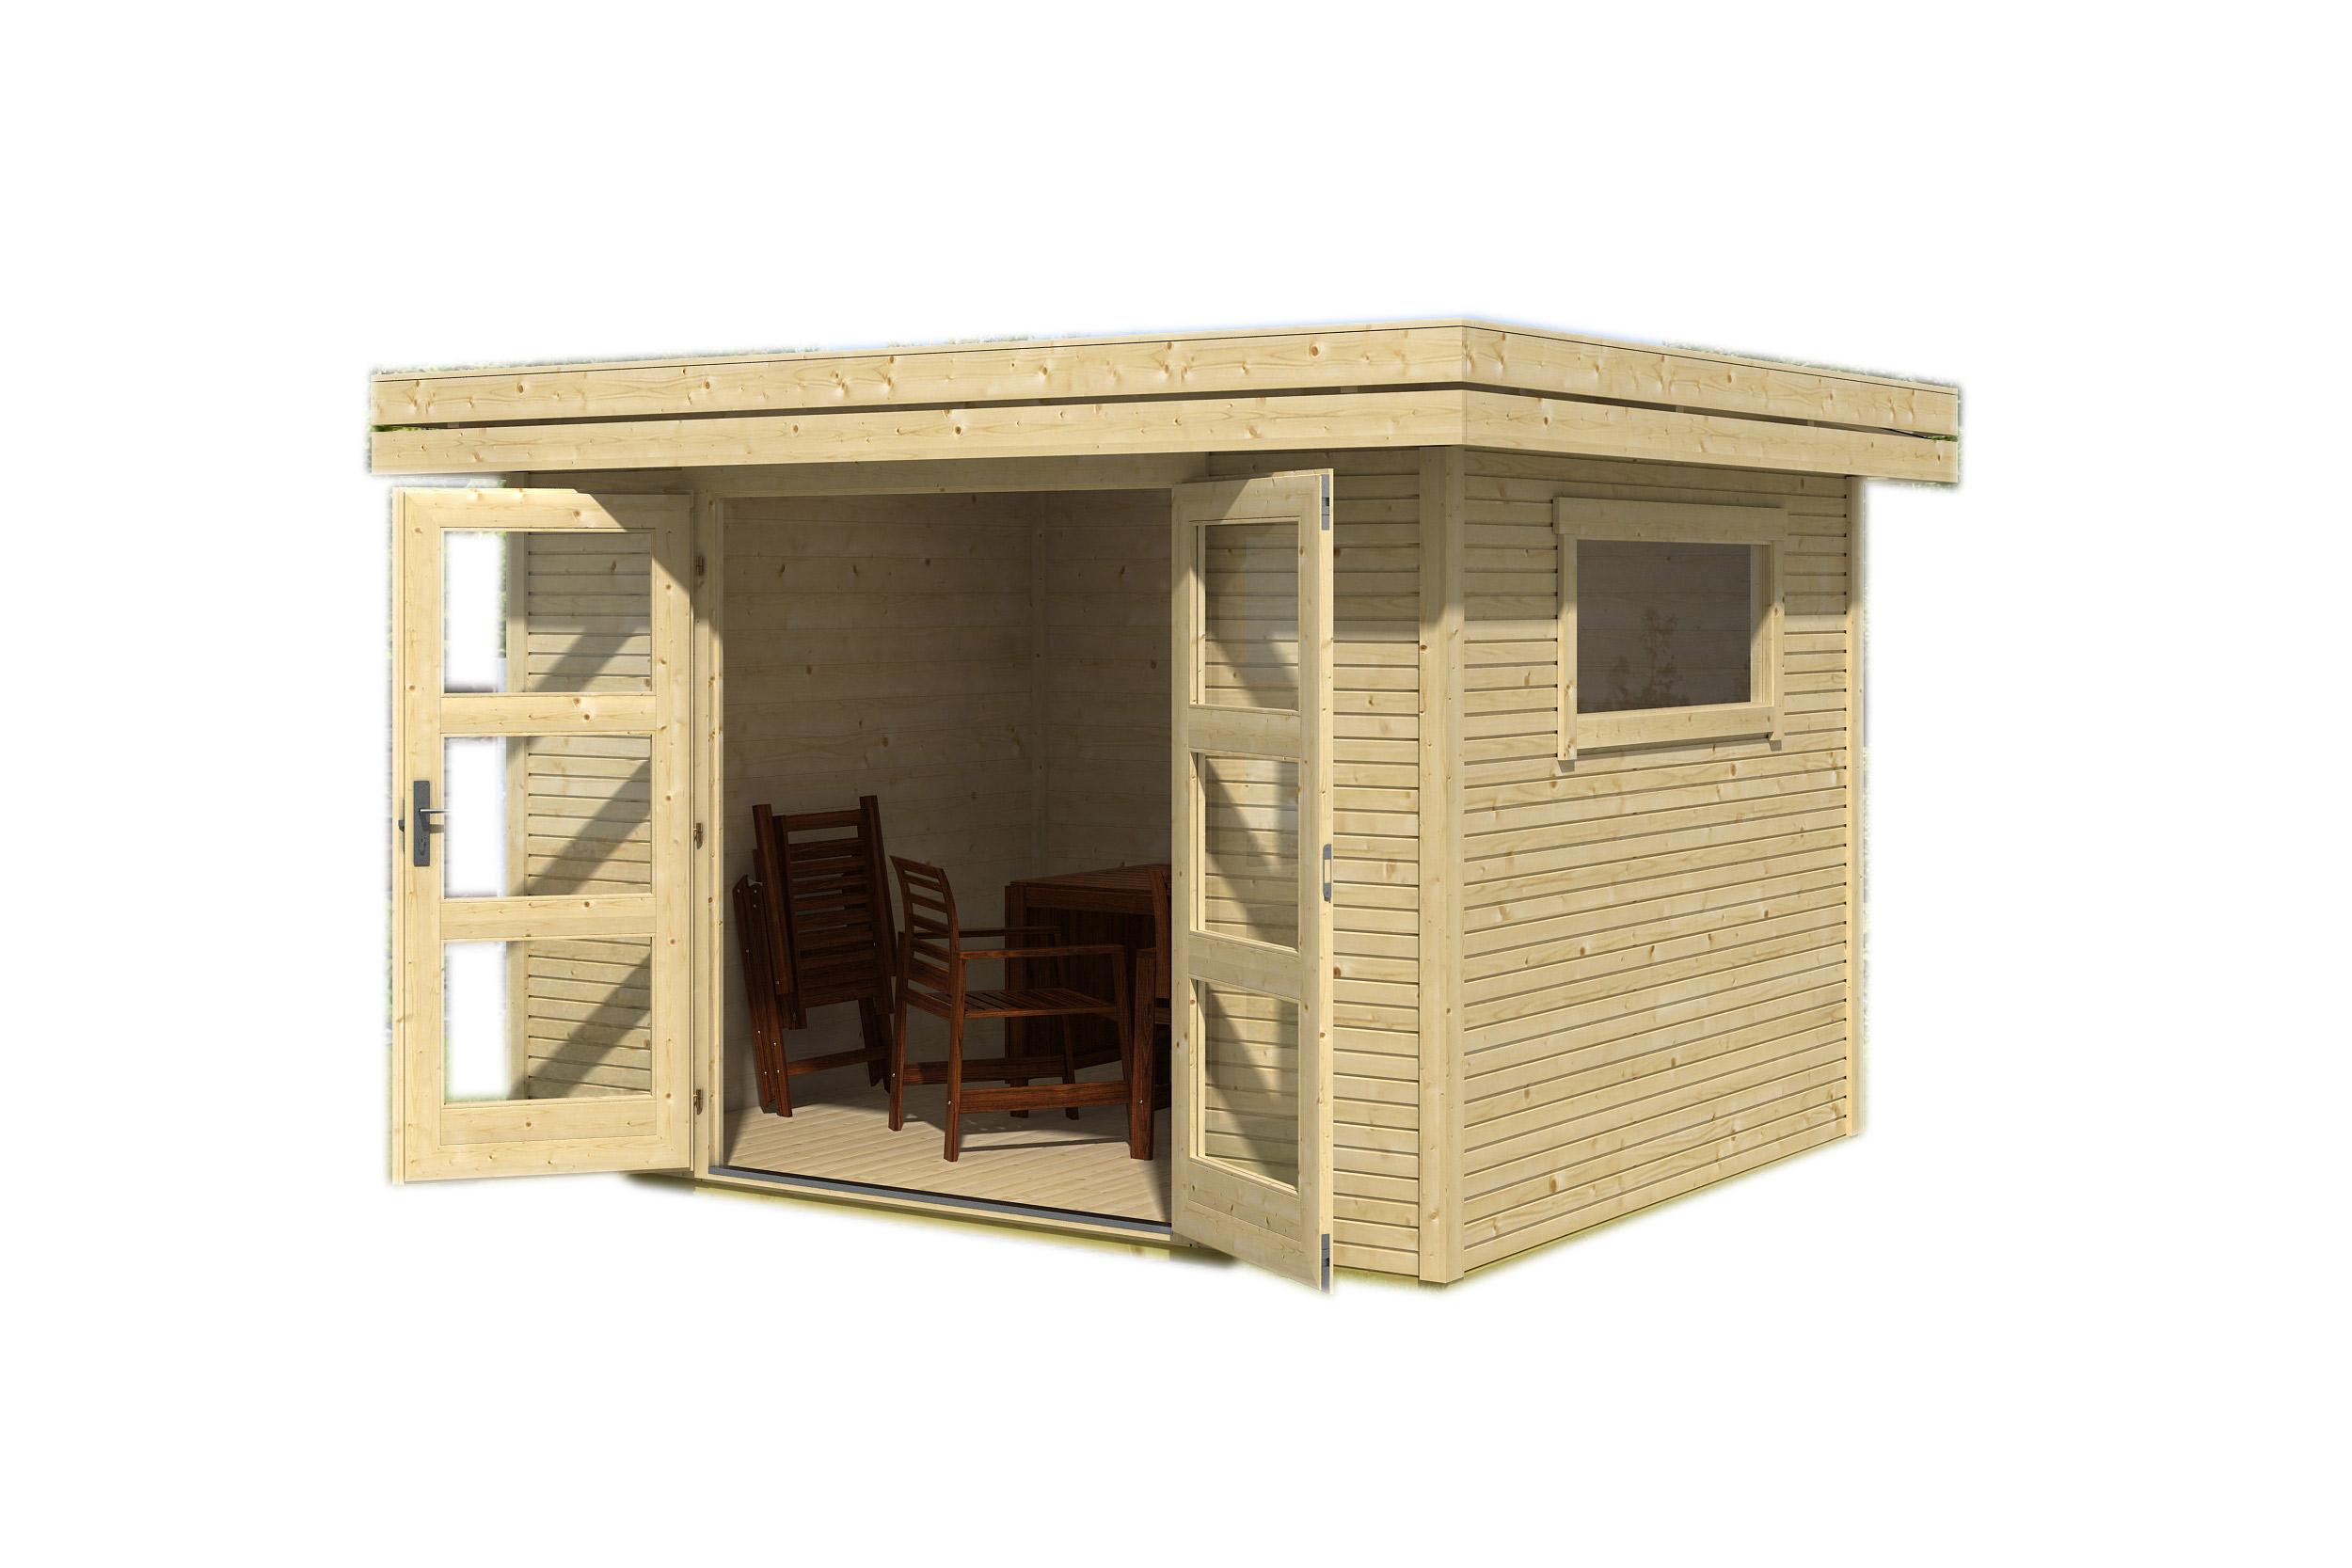 Abri De Jardin Toit Plat - Achat Abri Design Ou Abri De ... avec Abri Jardin 10M2